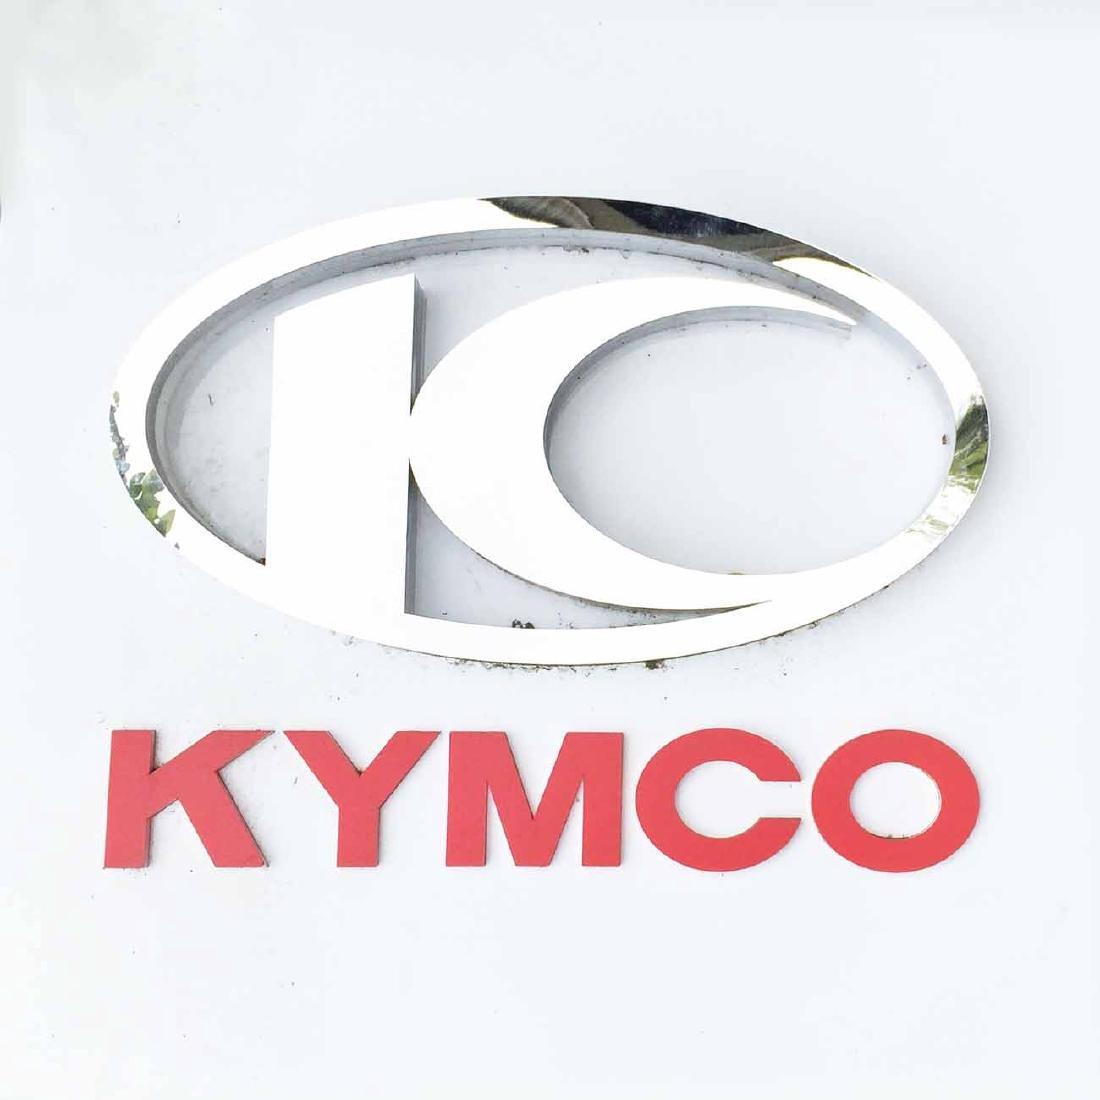 Kymco Sign